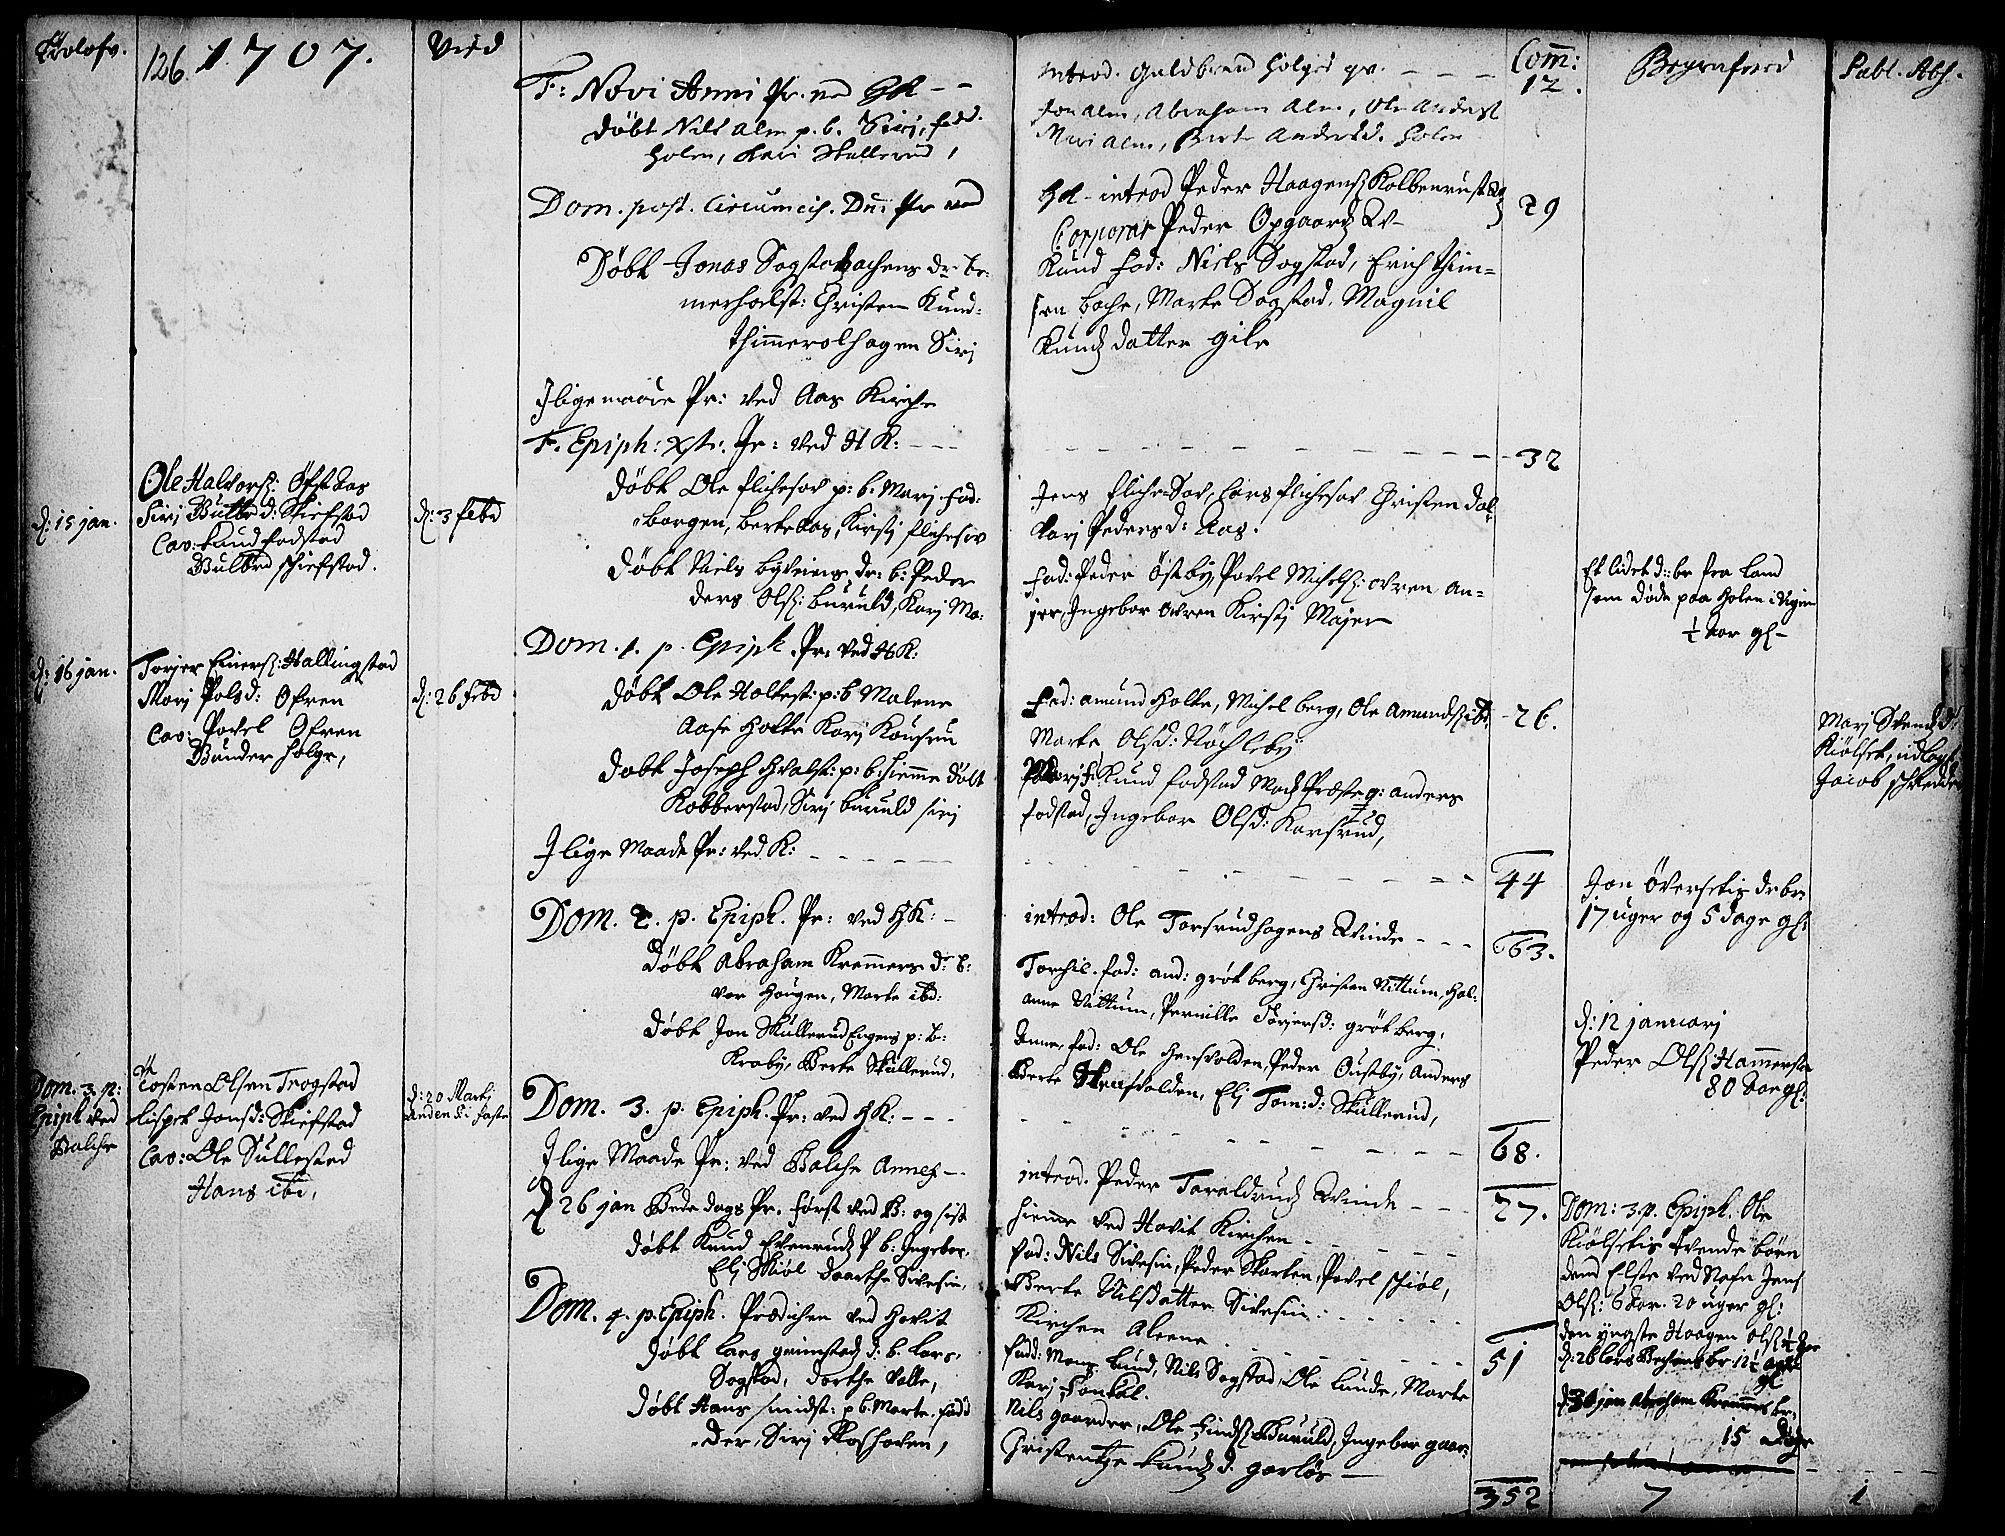 SAH, Toten prestekontor, Ministerialbok nr. 1, 1695-1713, s. 126